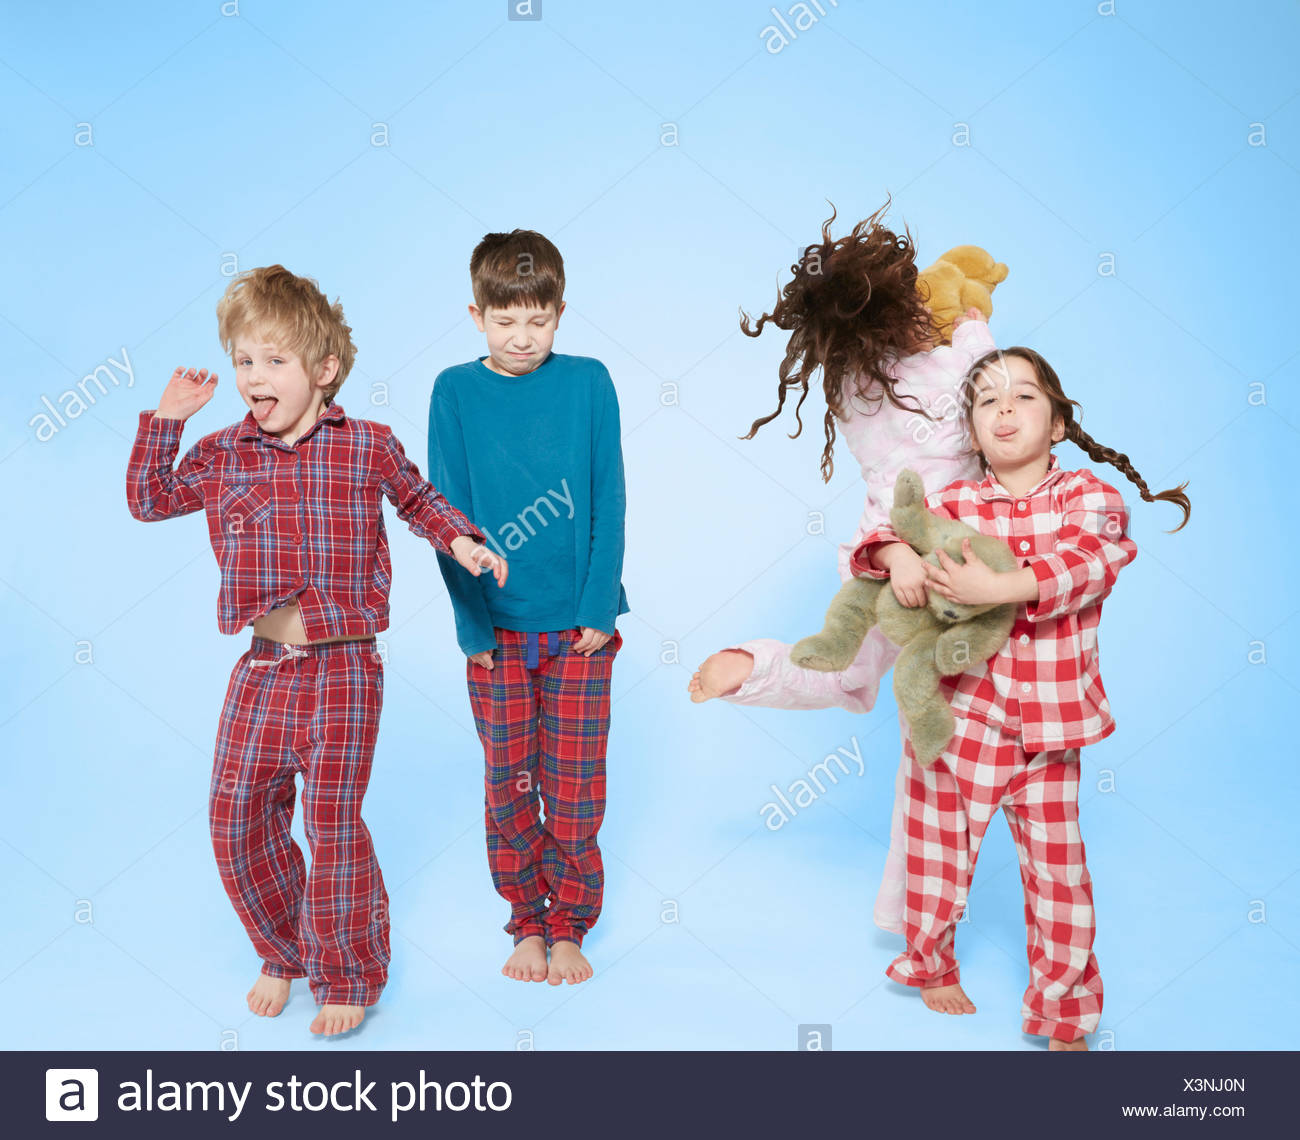 Children in pyjamas dancing and jumping - Stock Image